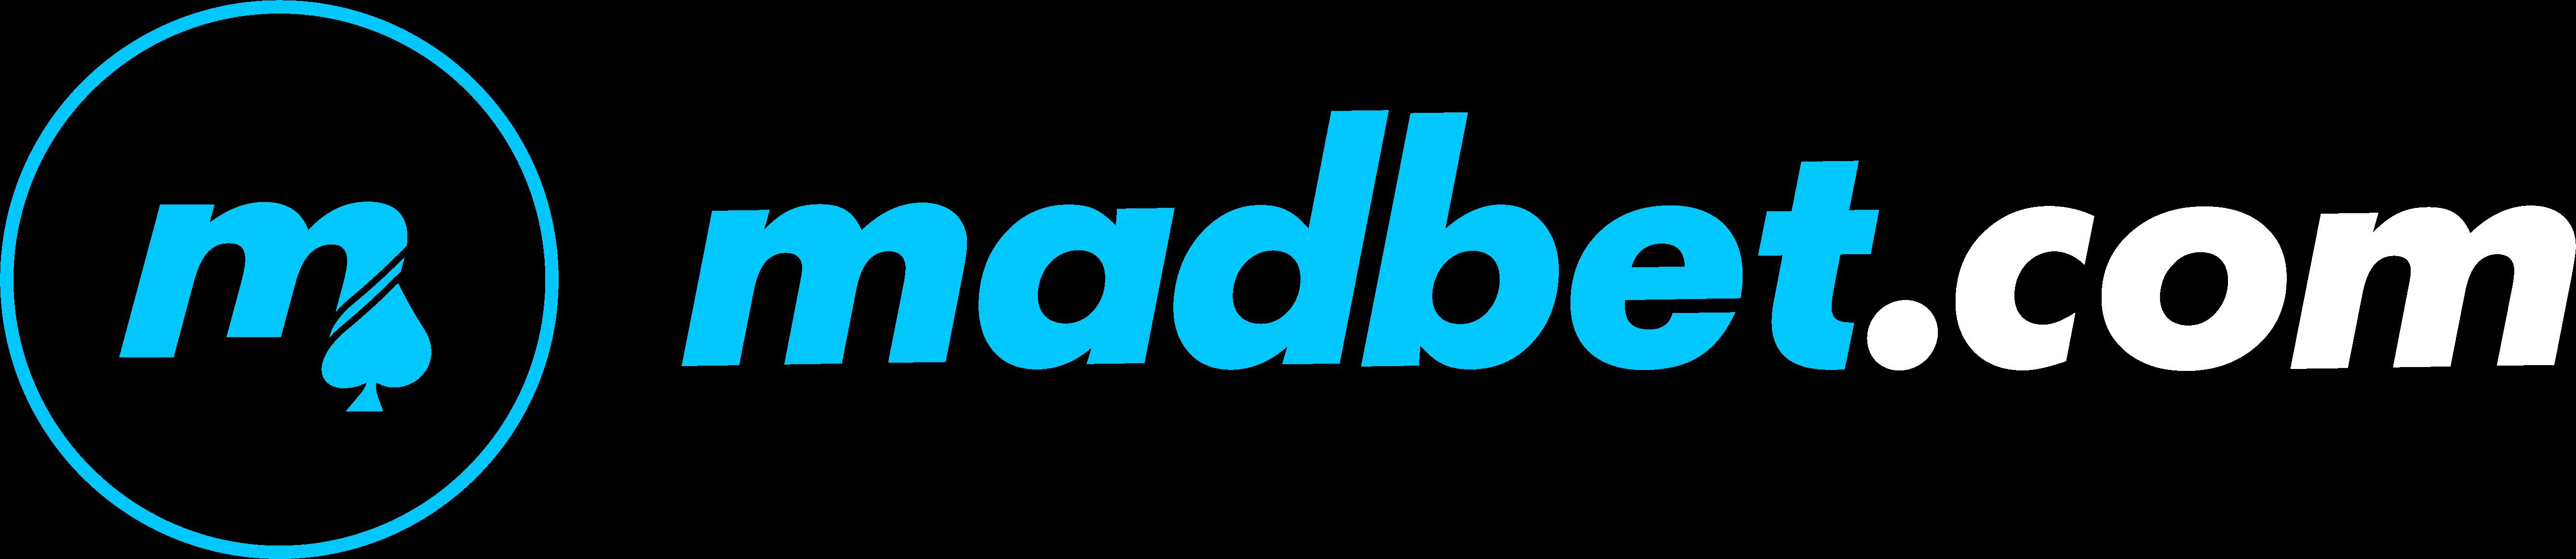 Código promocional Madbet: ¡consigue un 100% respecto a tu primer depósito!